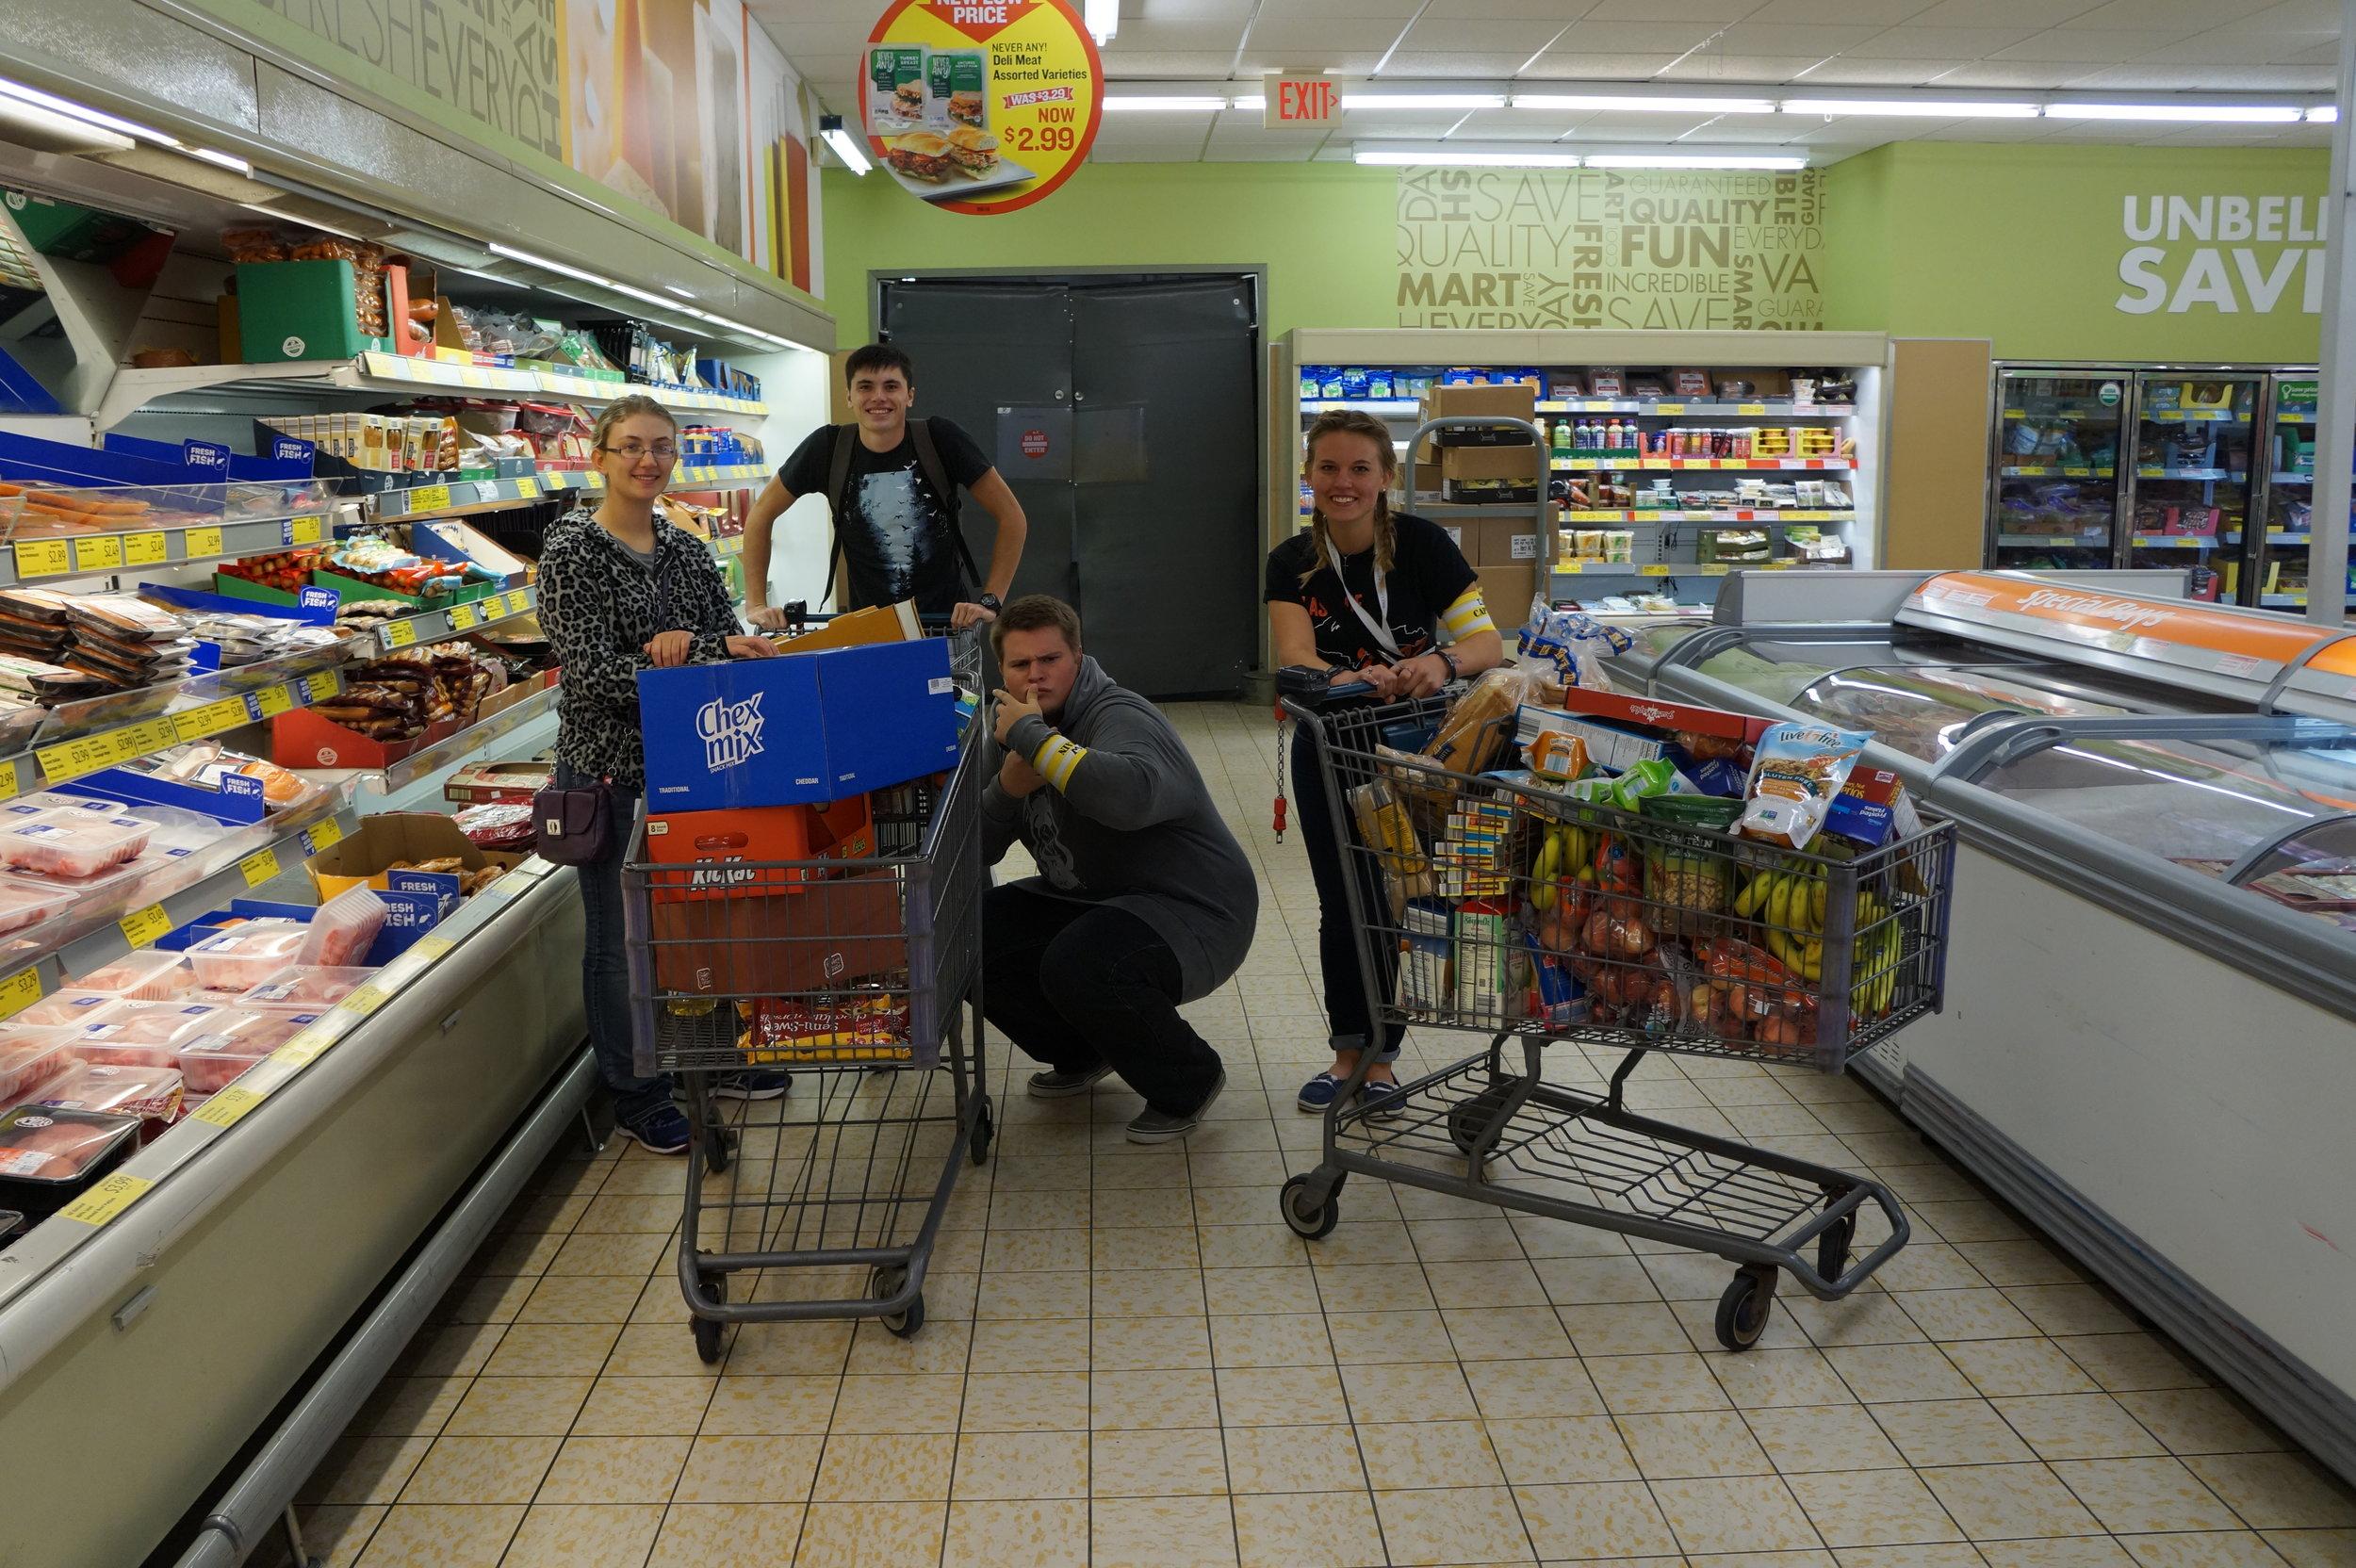 Grocery shopping for breakfast!